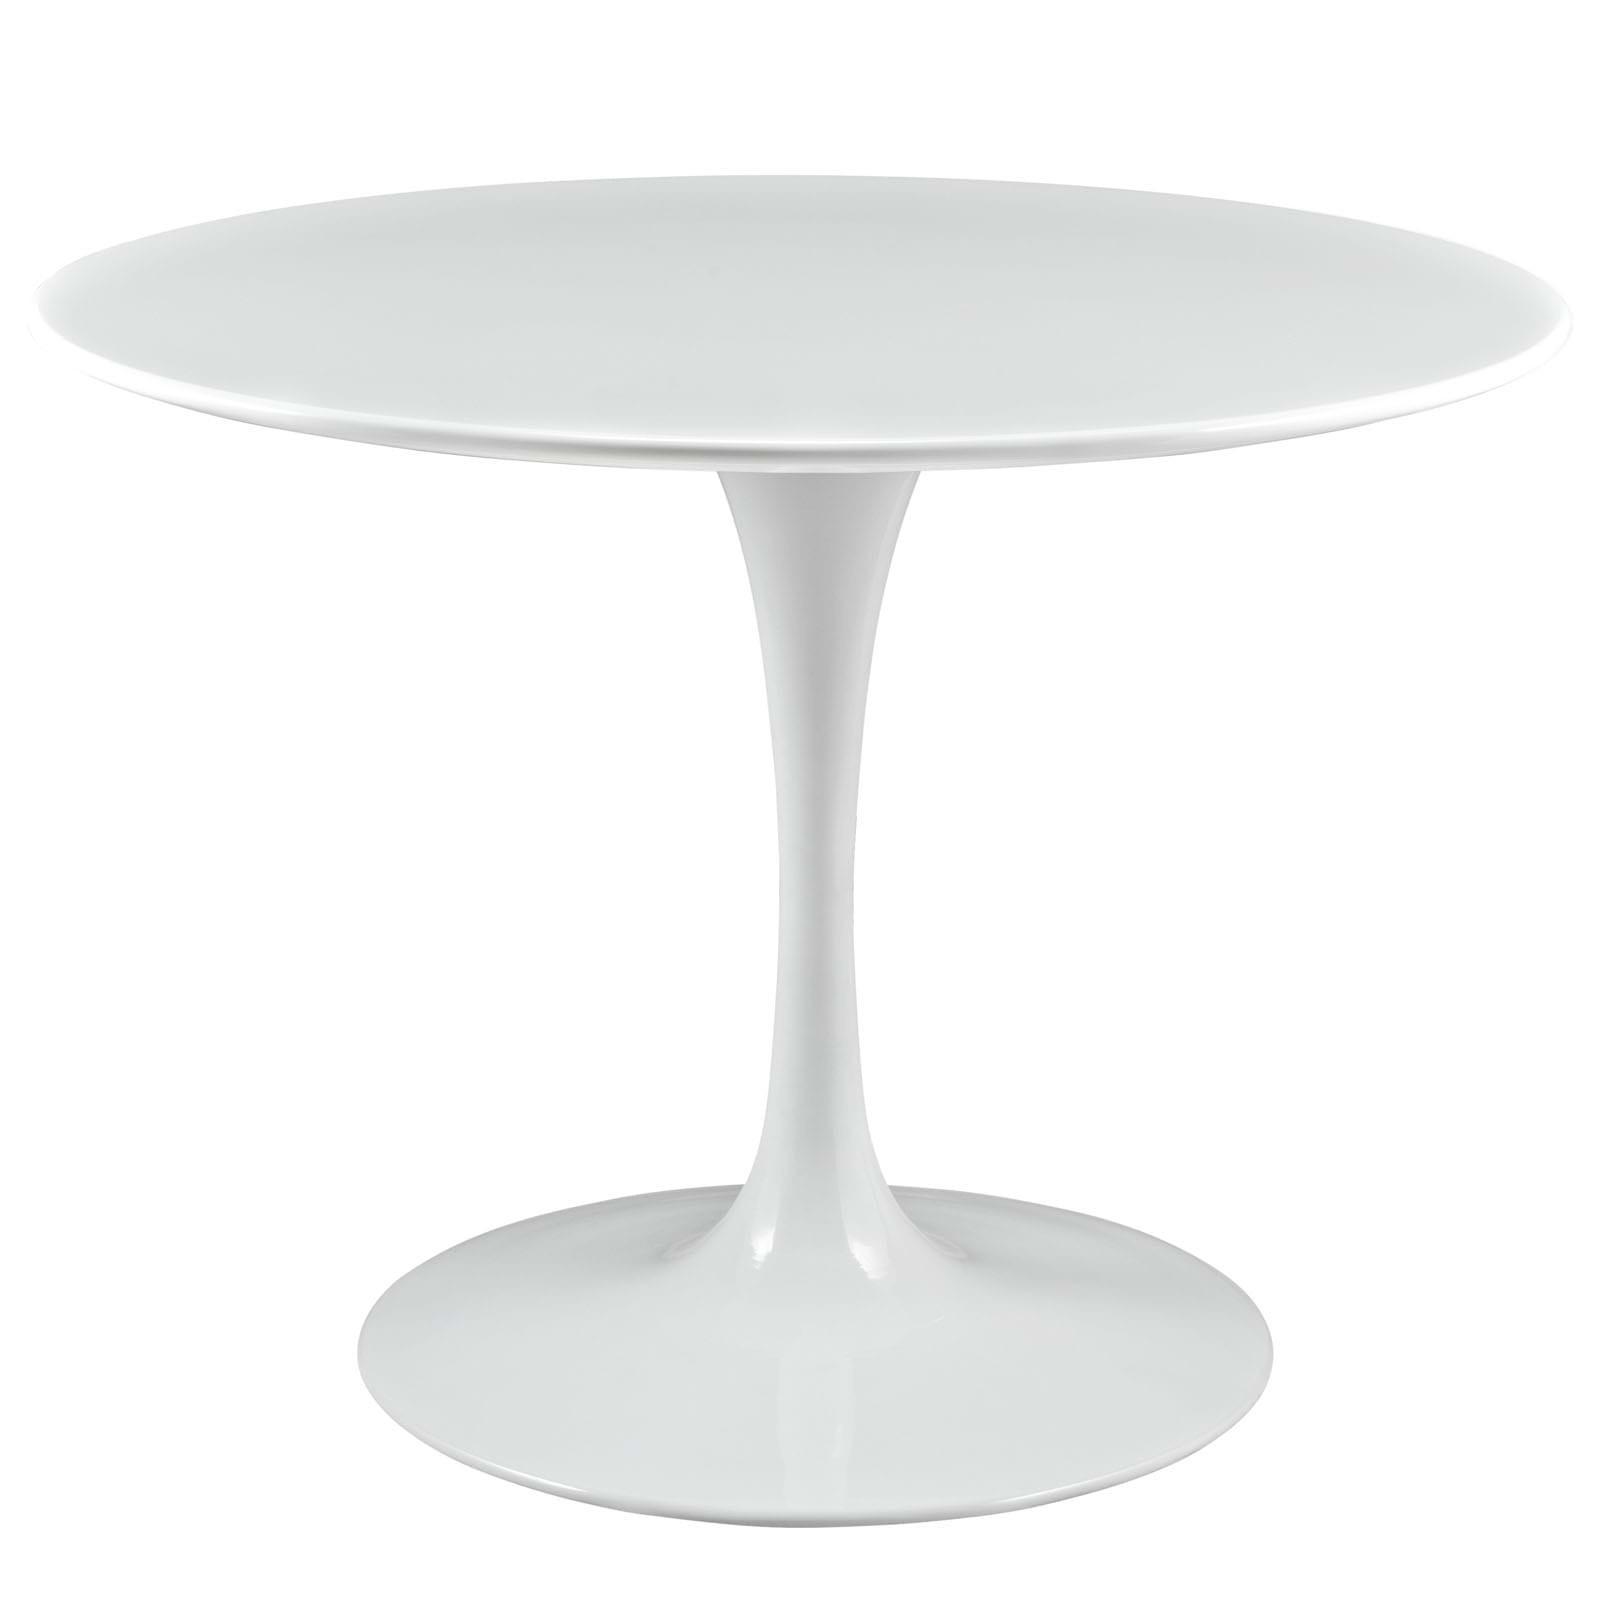 "Lippa 40"" Wood Top Dining Table"